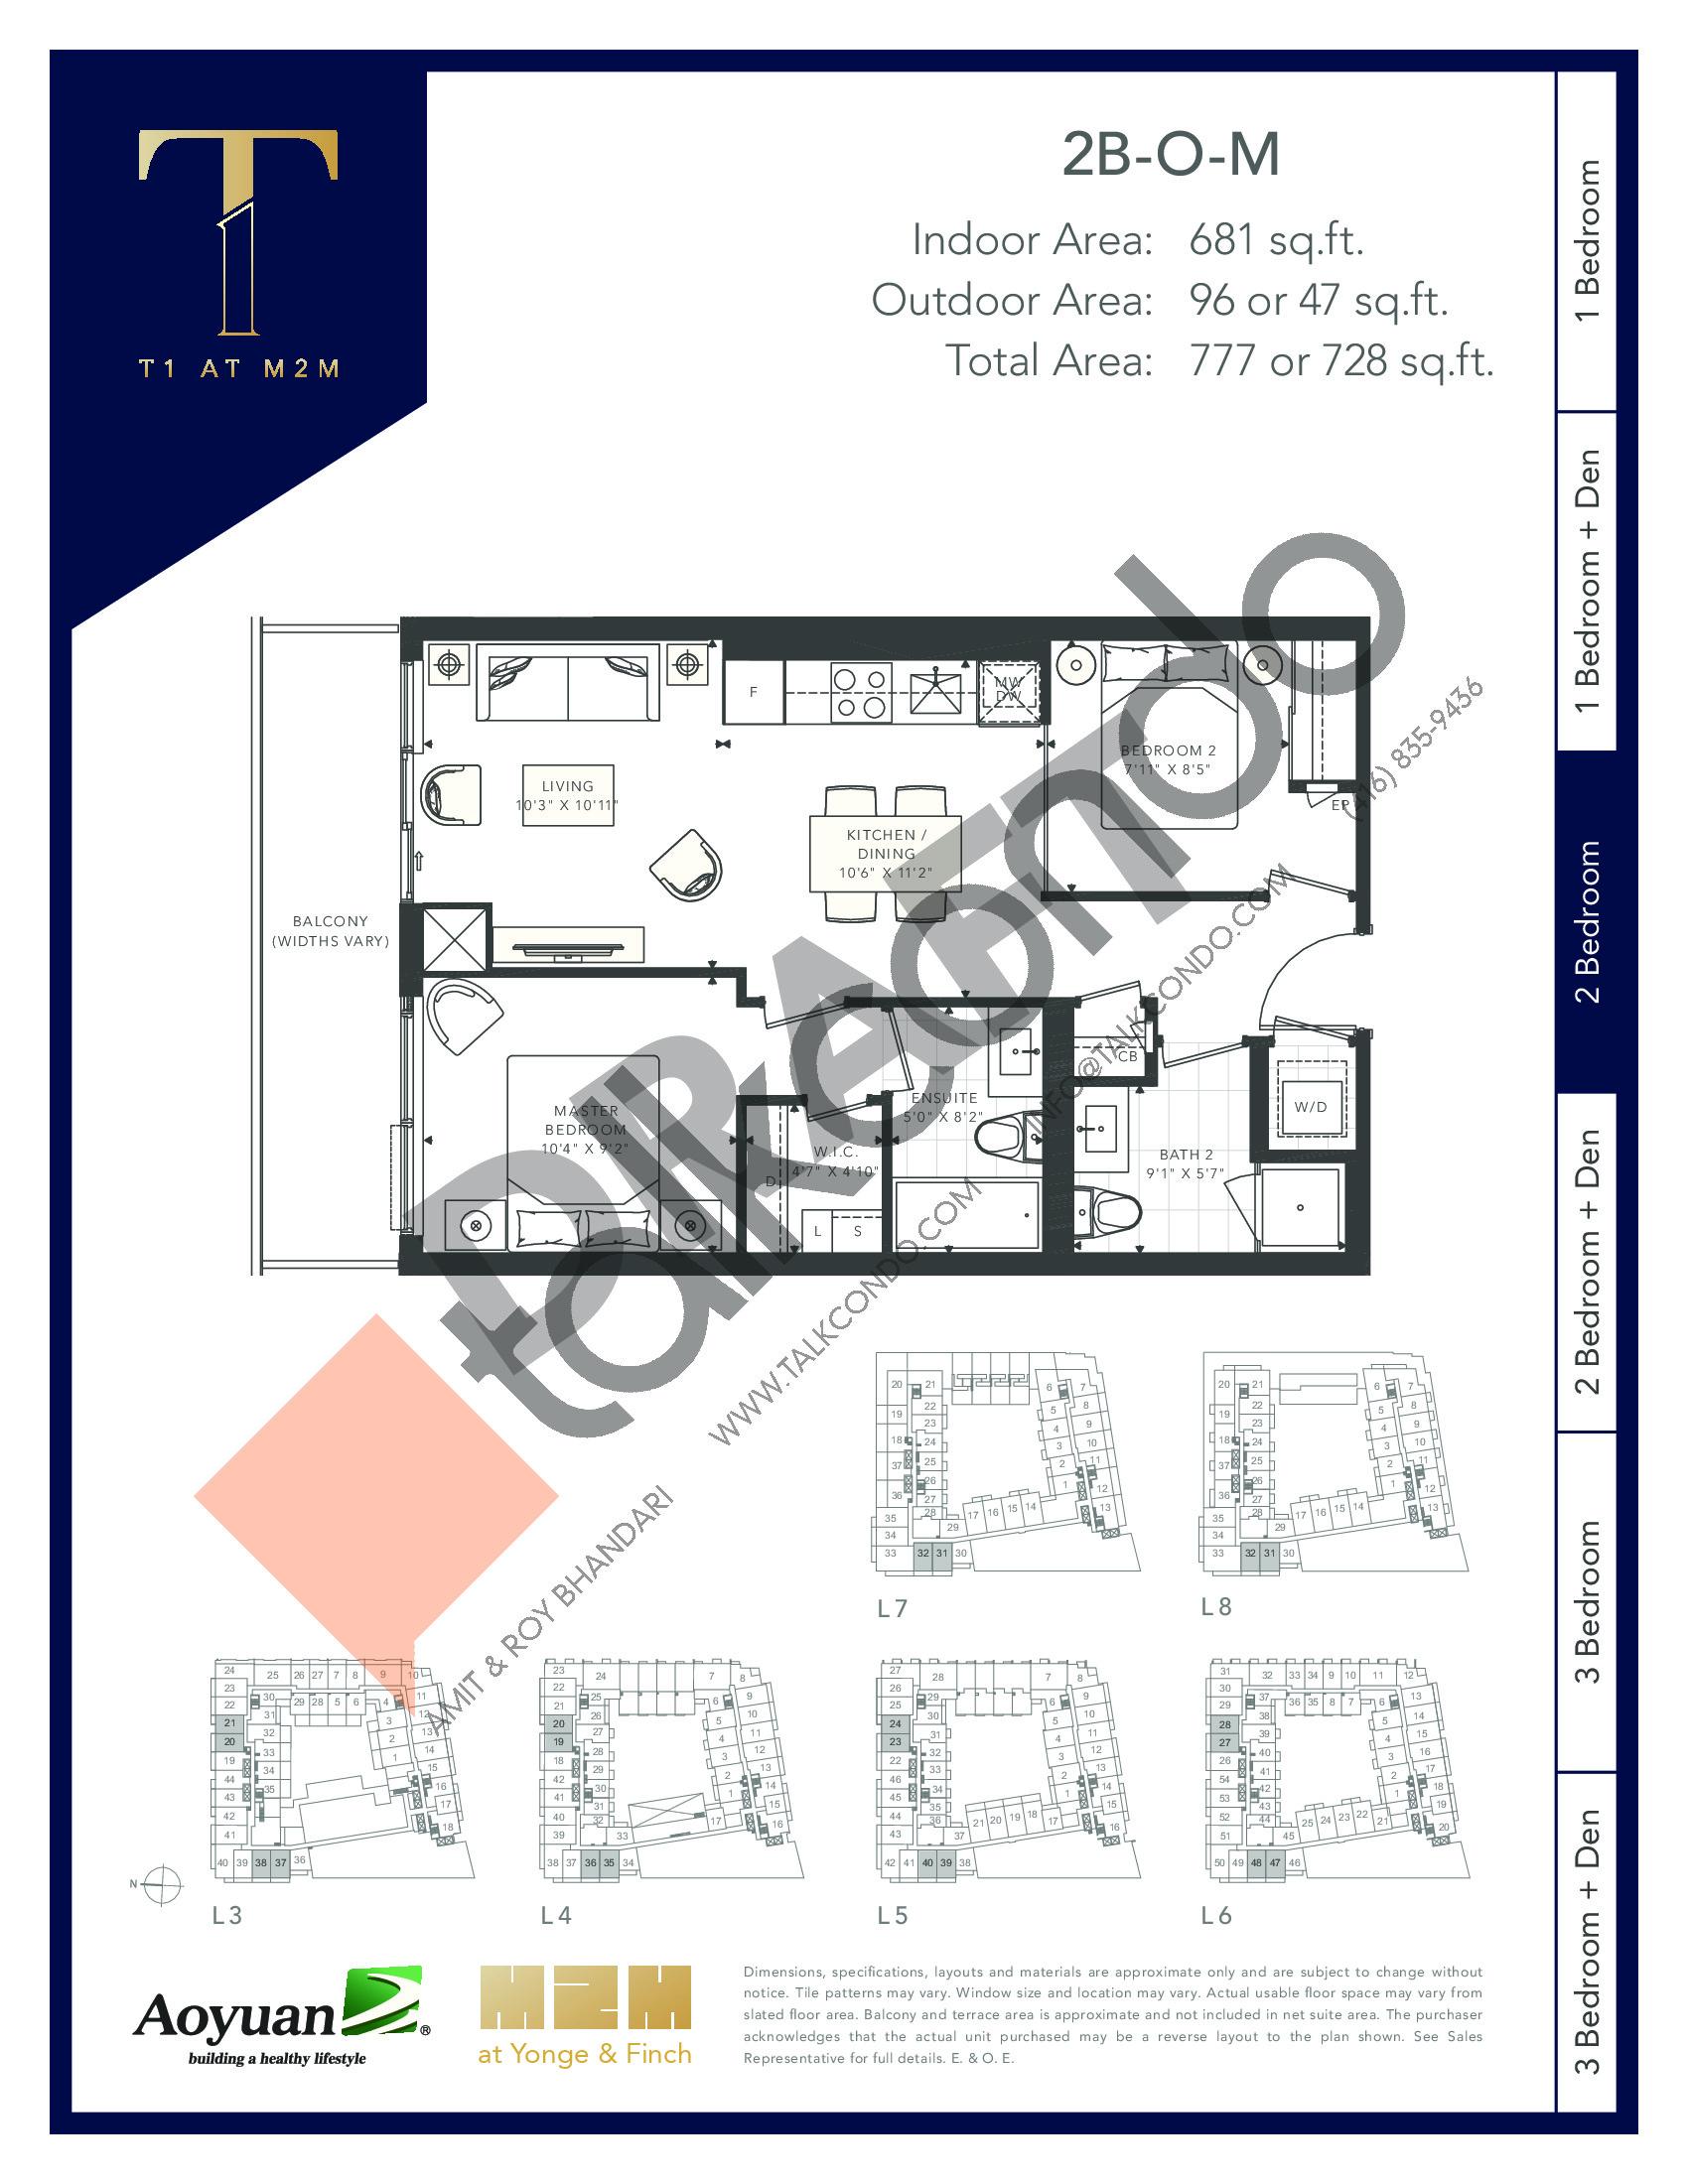 2B-O-M (Podium) Floor Plan at T1 at M2M Condos - 681 sq.ft